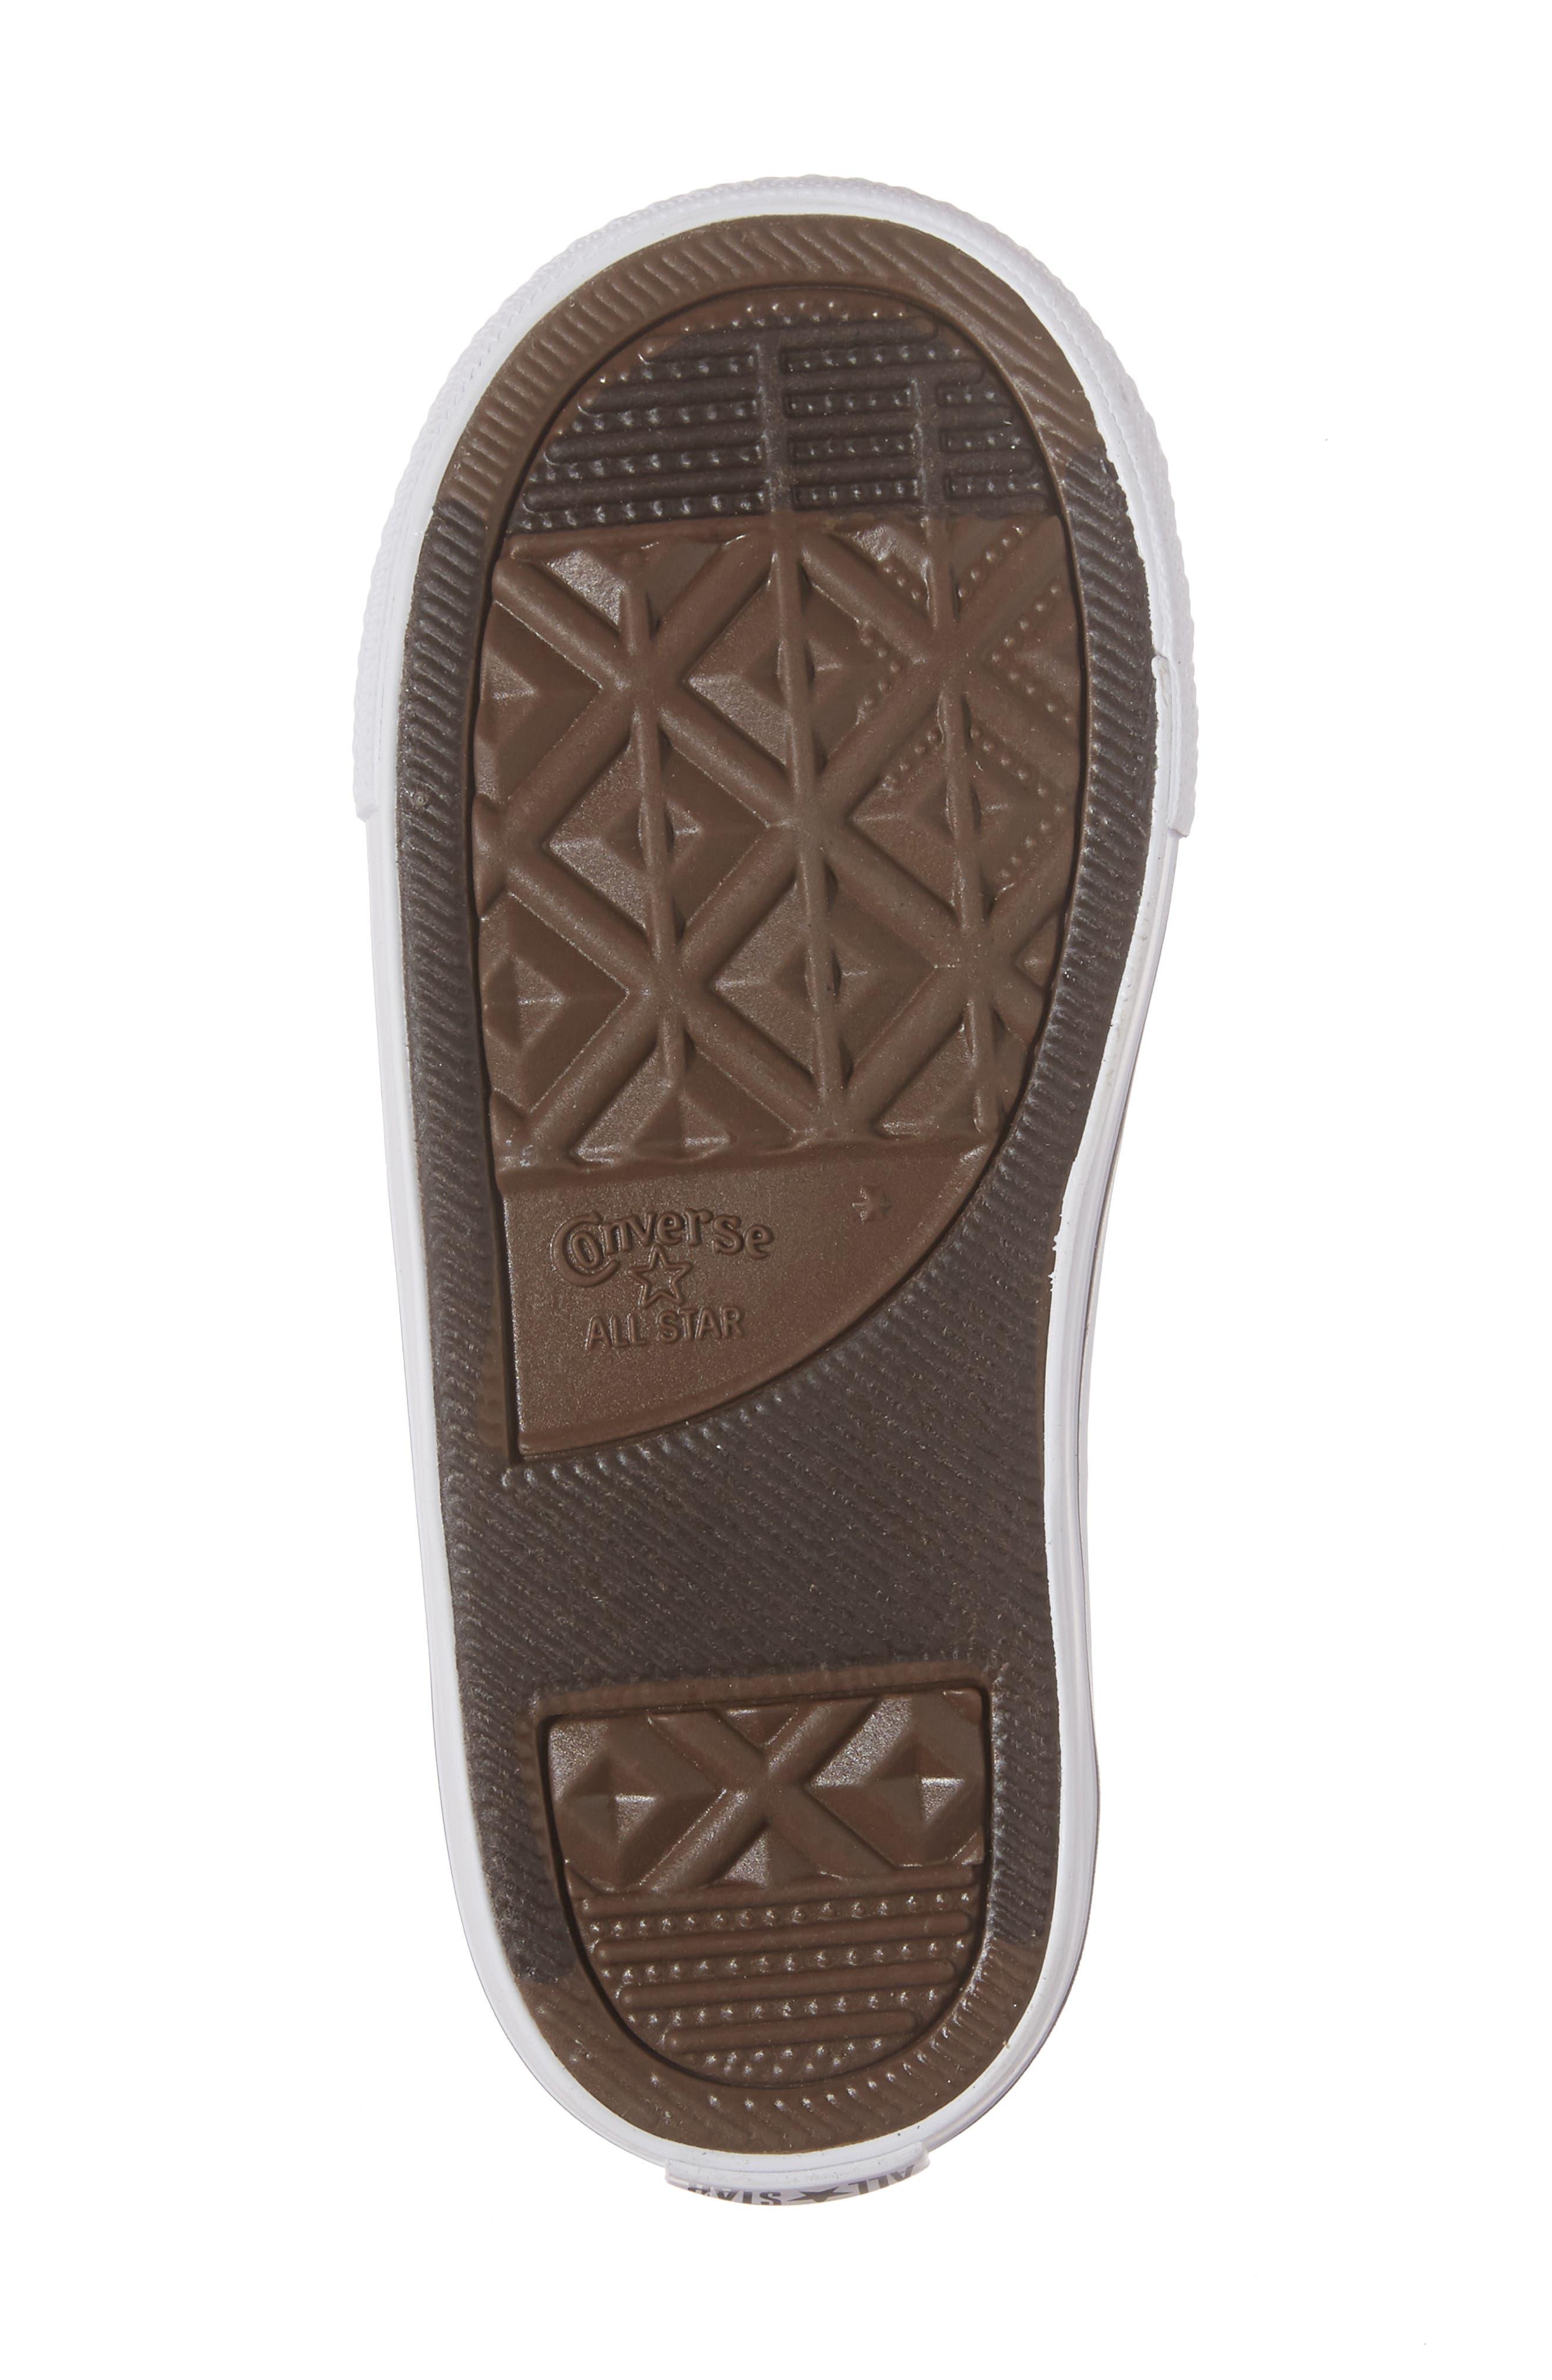 Chuck Taylor<sup>®</sup> All Star<sup>®</sup> Seasonal Metallic Low Top Sneaker,                             Alternate thumbnail 6, color,                             040